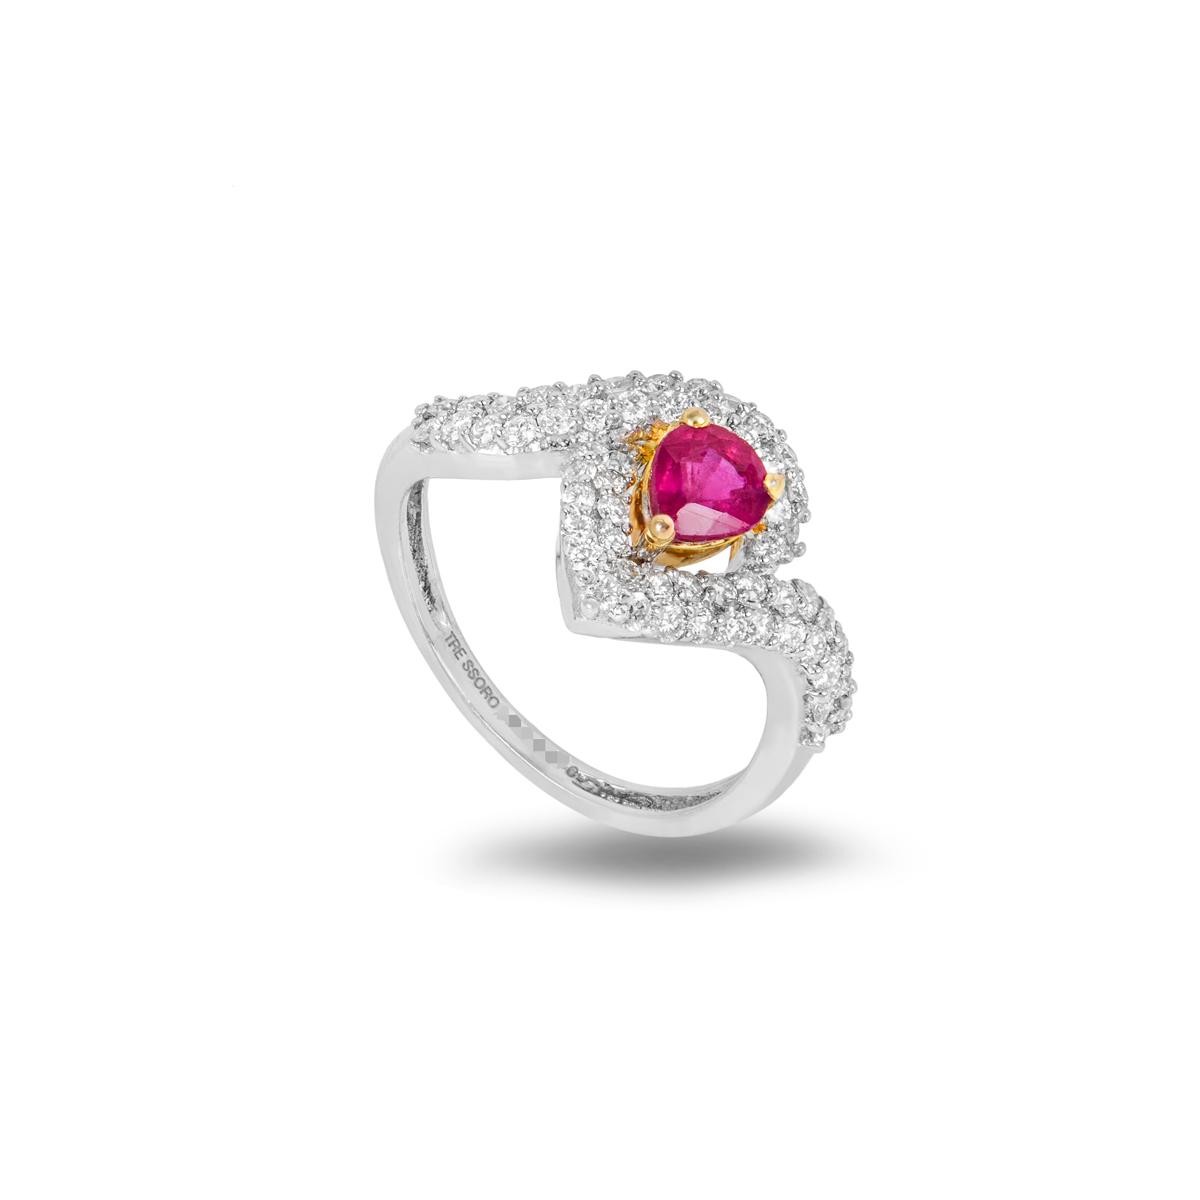 18k White Gold Diamond and Ruby Dress Ring 0.66ct H/VS2